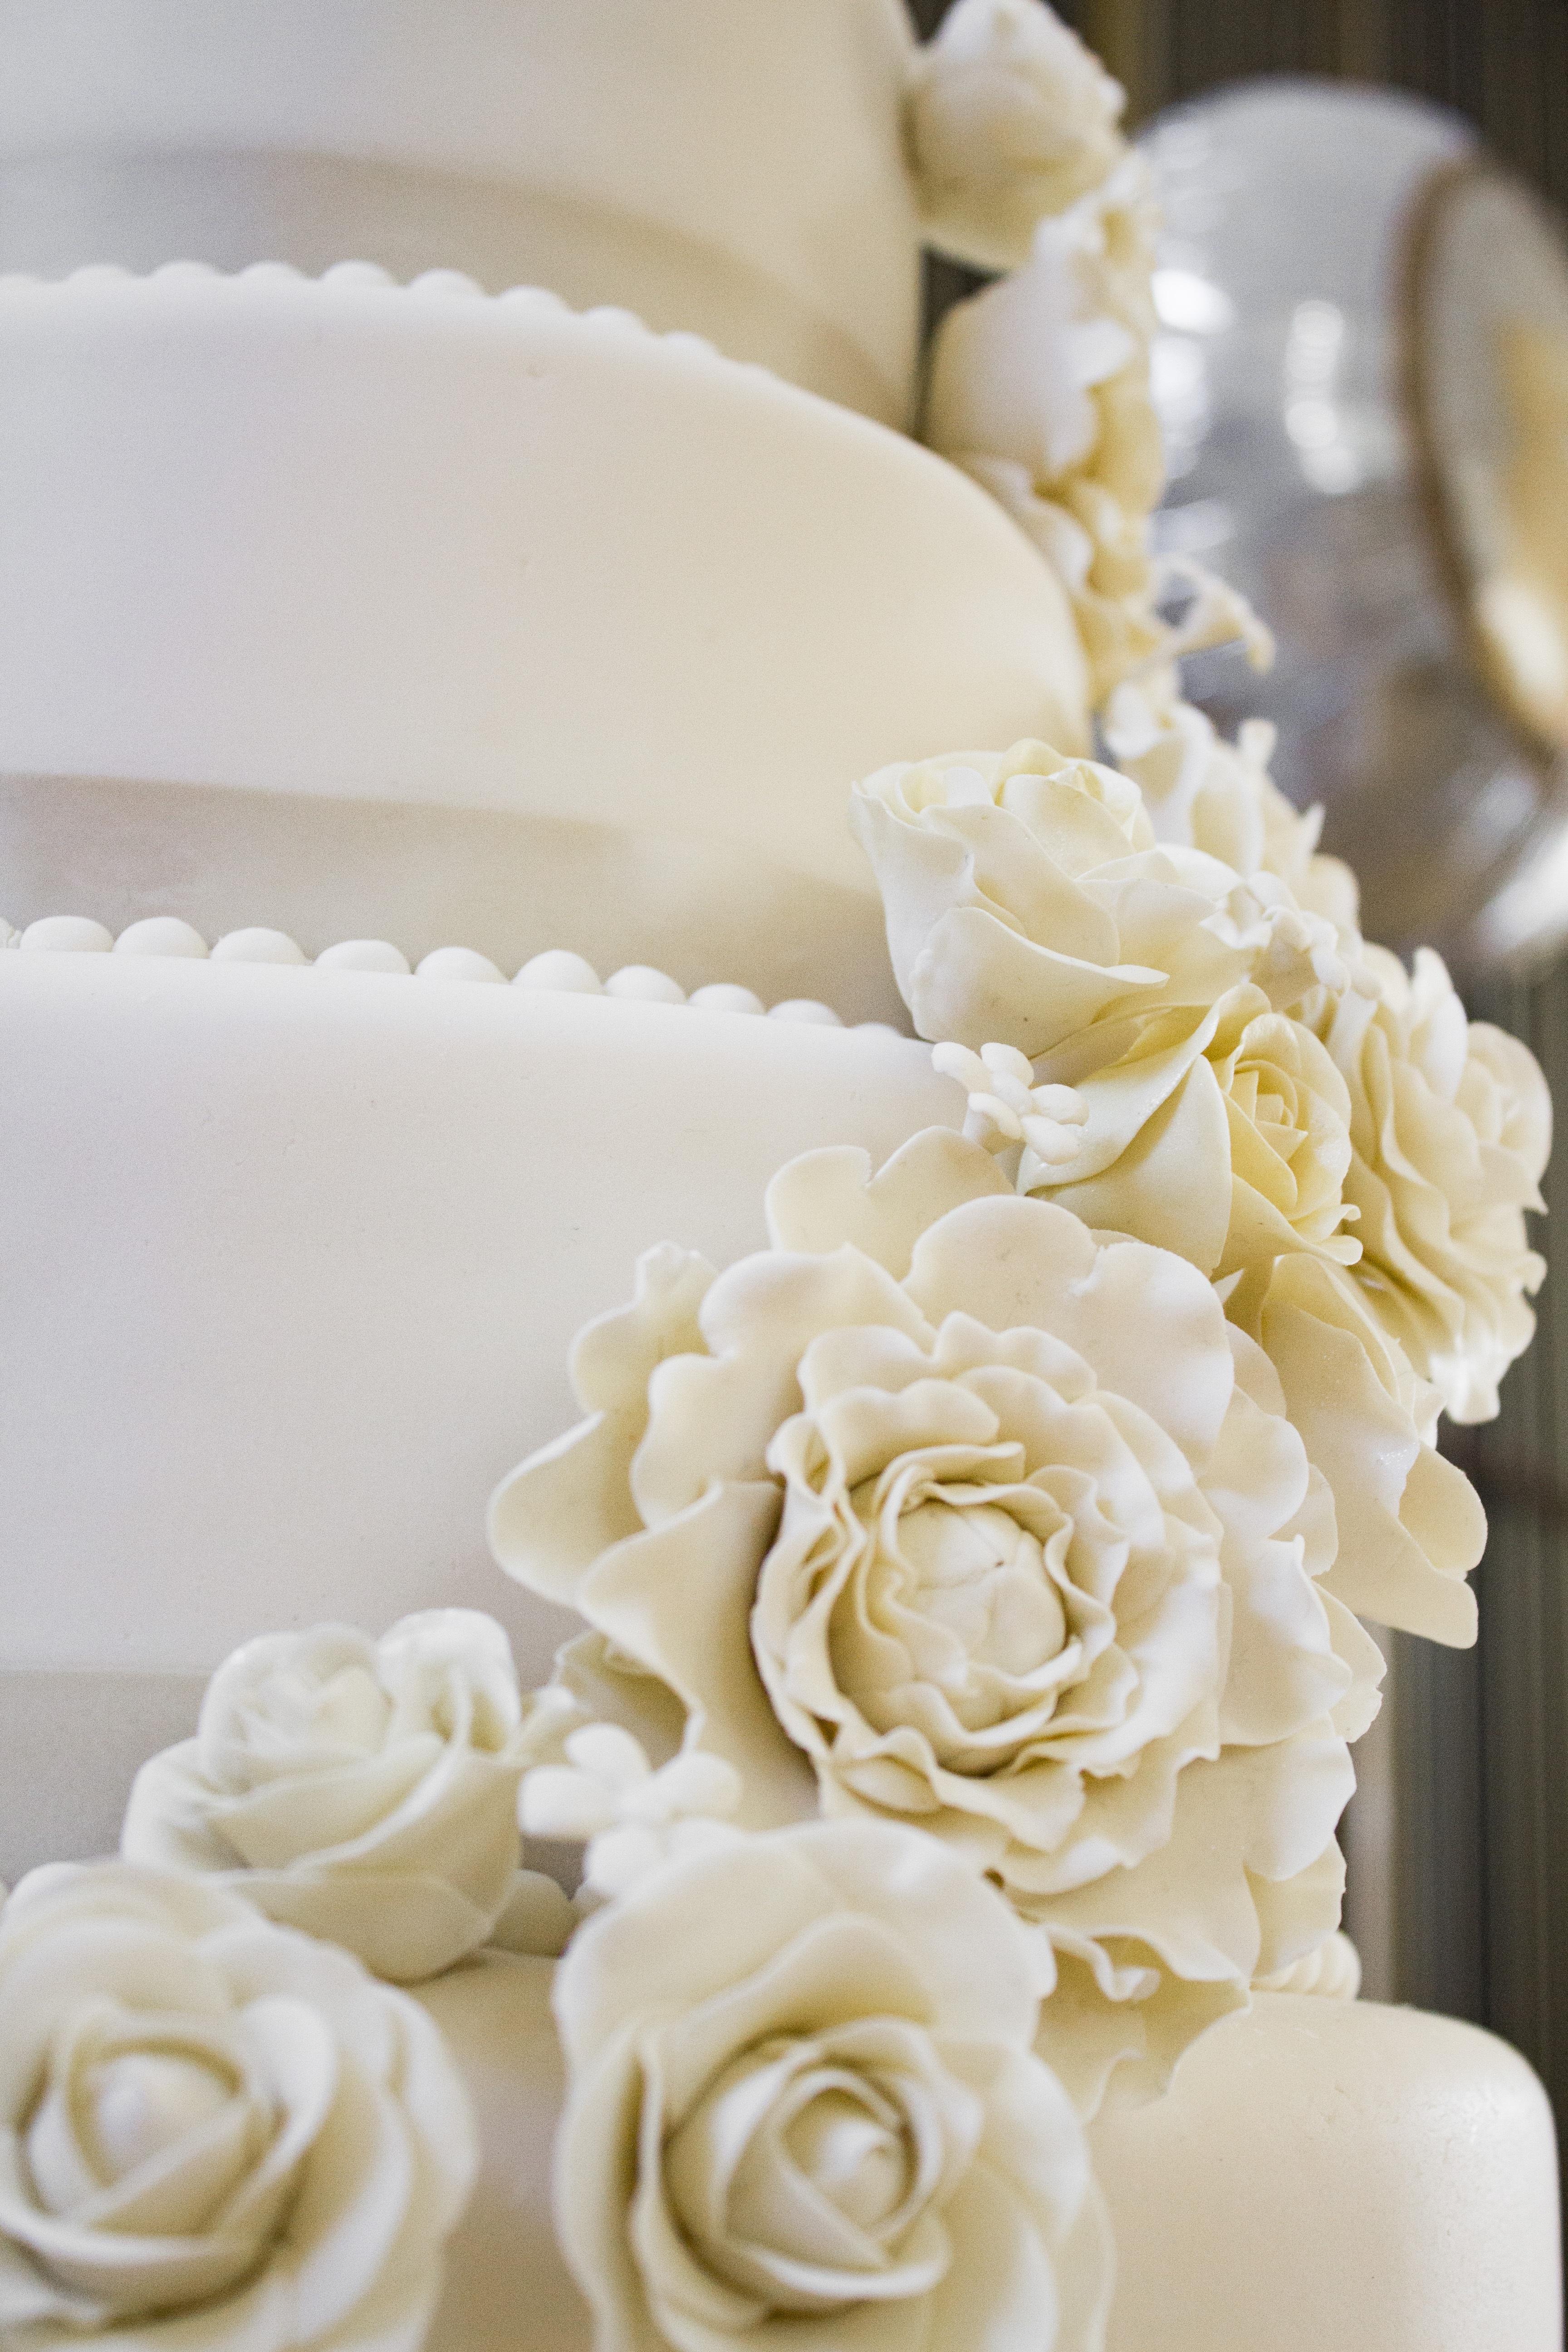 Free Images White Sweet Petal Celebration Decoration Food